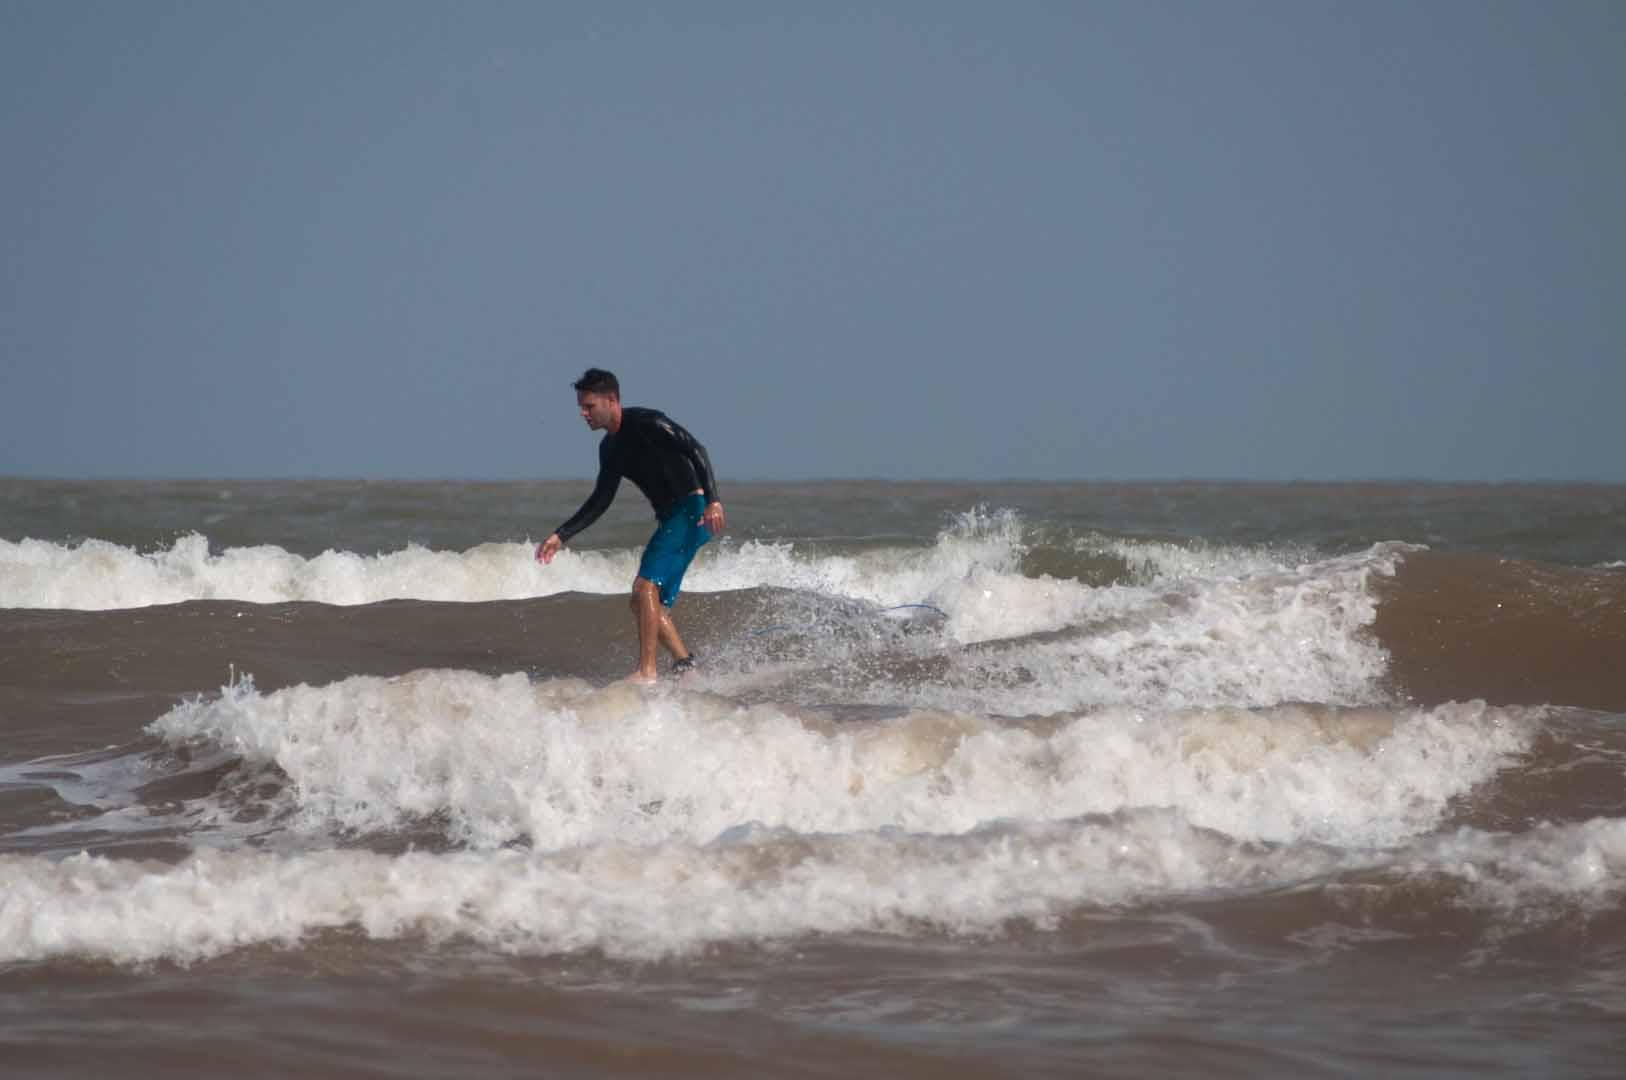 SurfsideJuly2_20150702_131